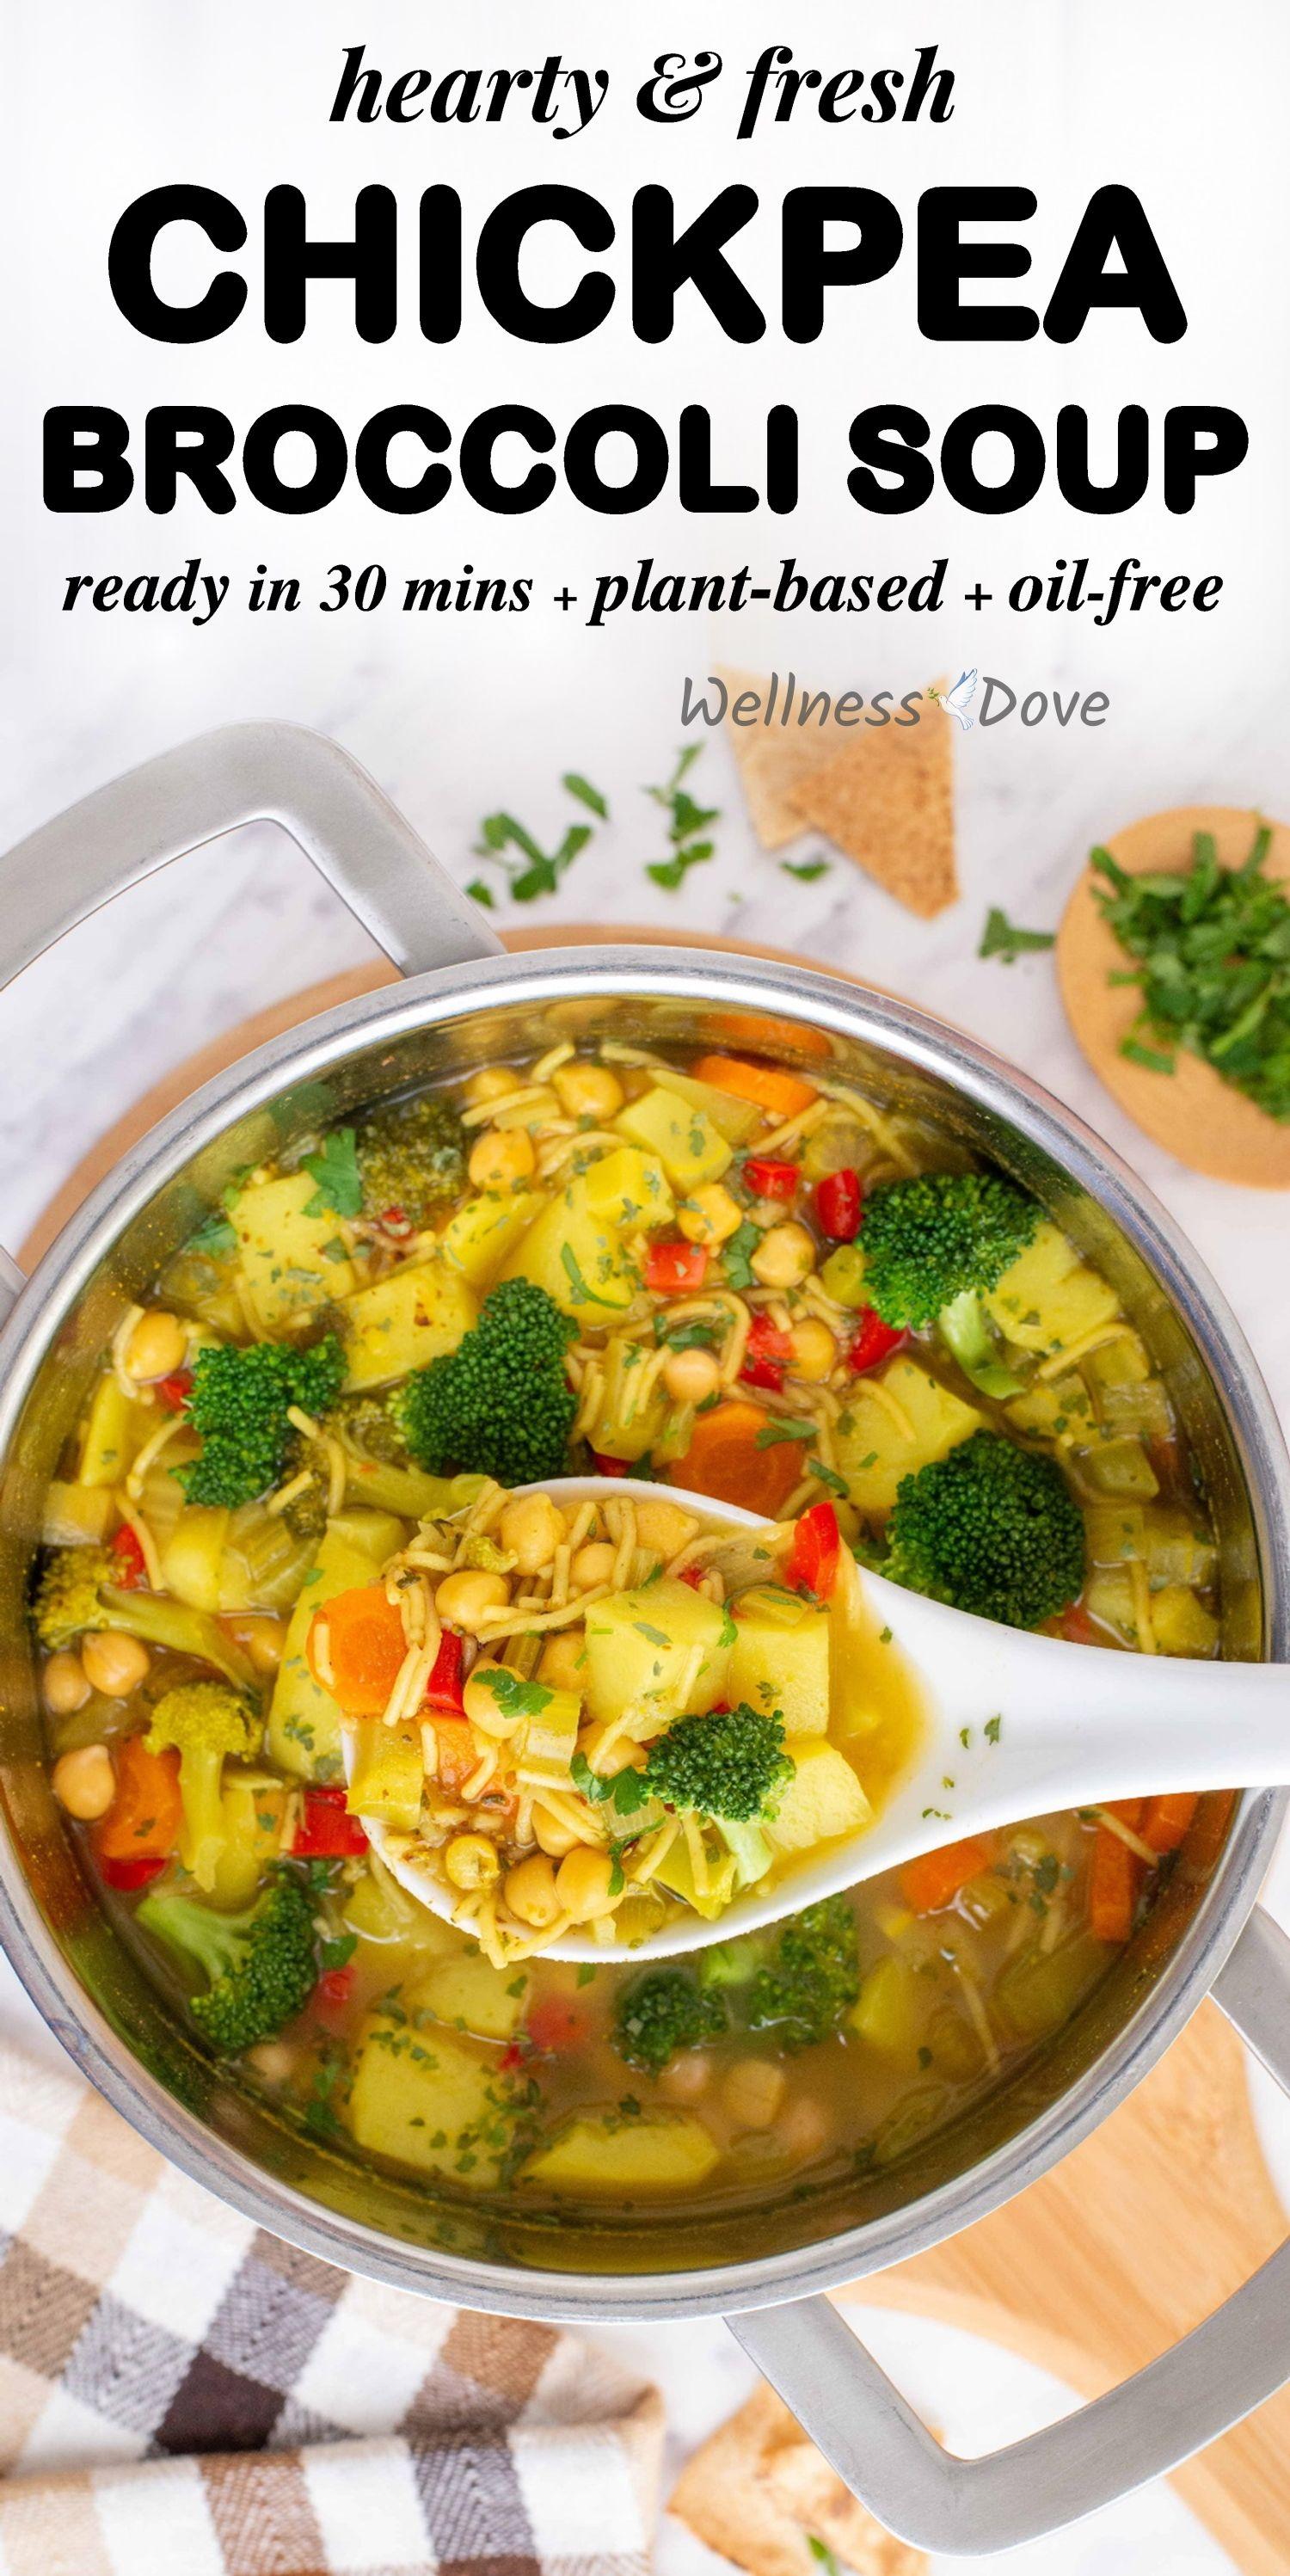 Hearty Fresh Chickpea Broccoli Soup Wellnessdove Recipe In 2020 Whole Food Recipes Whole Foods Vegan Vegan Soup Recipes